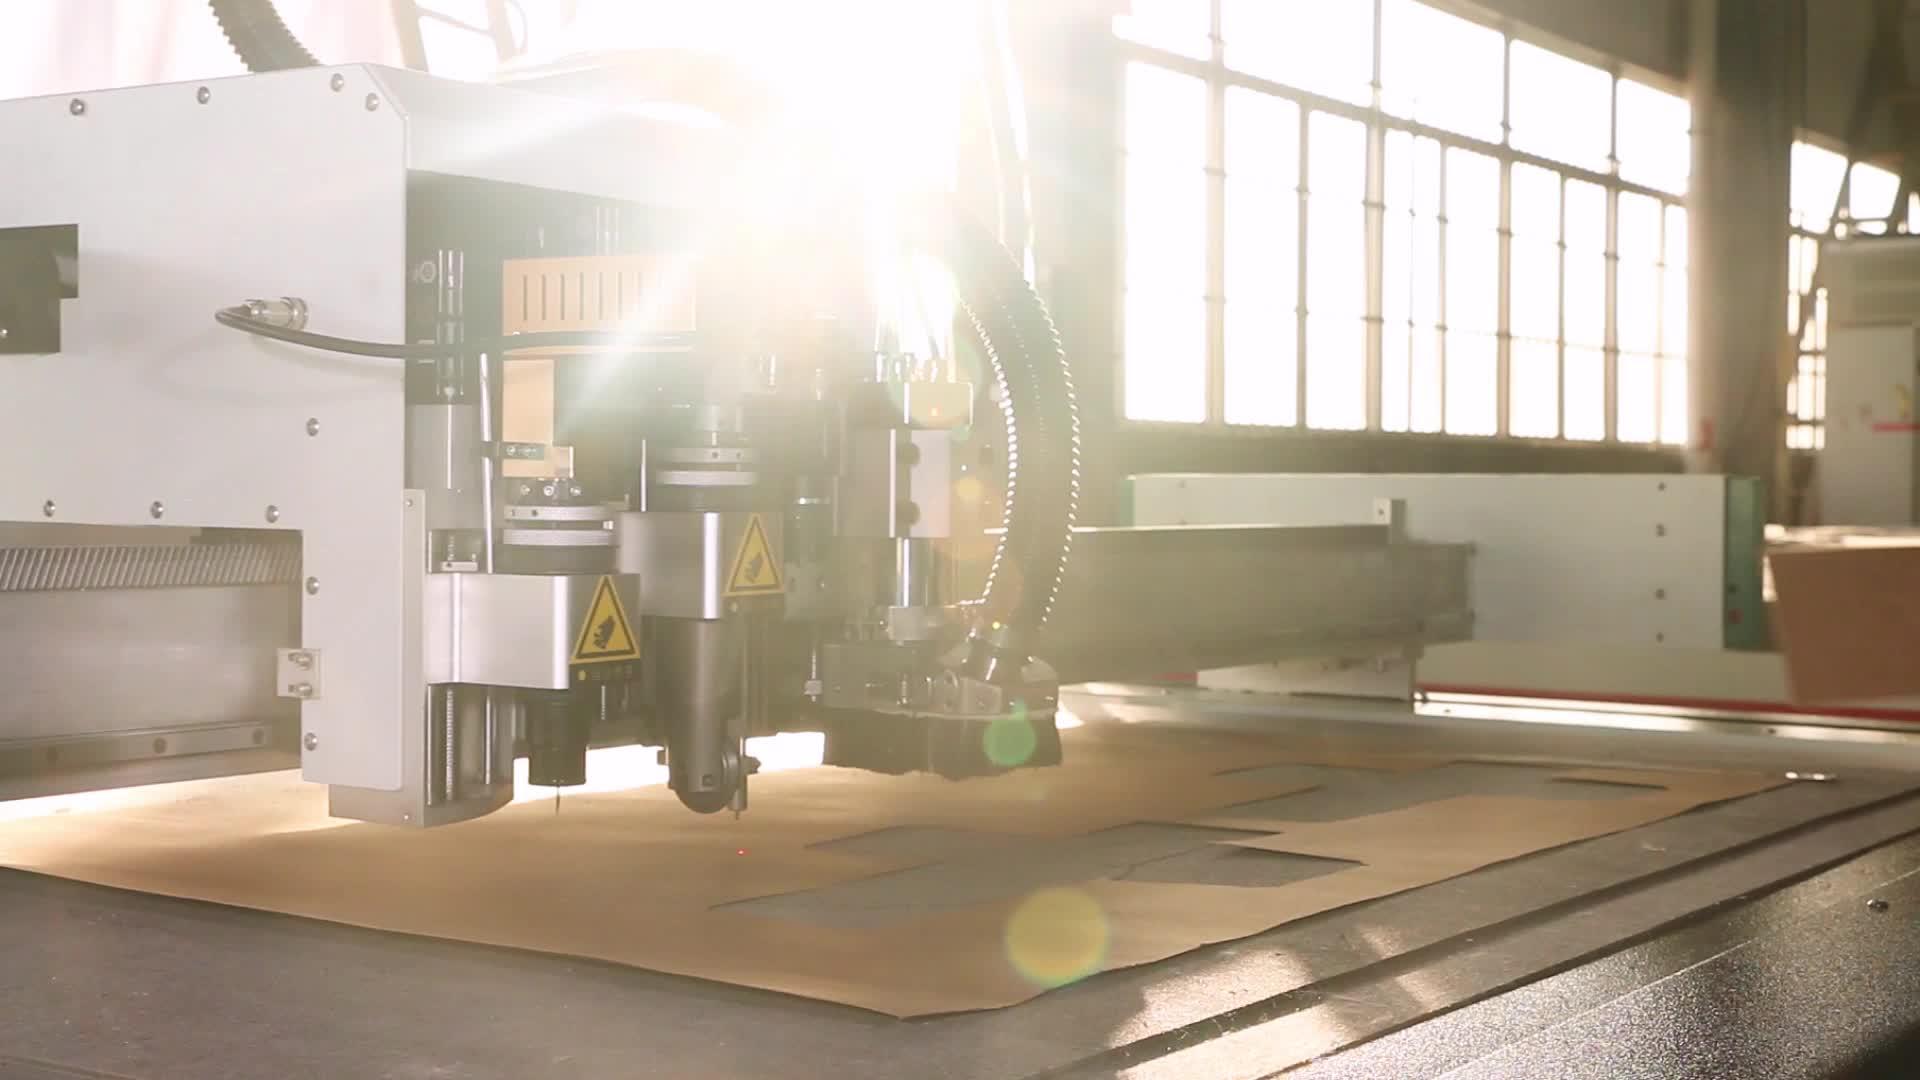 carton corrugated sheet  cnc oscillating v knife making cutting packaging machine for cardboard boxes